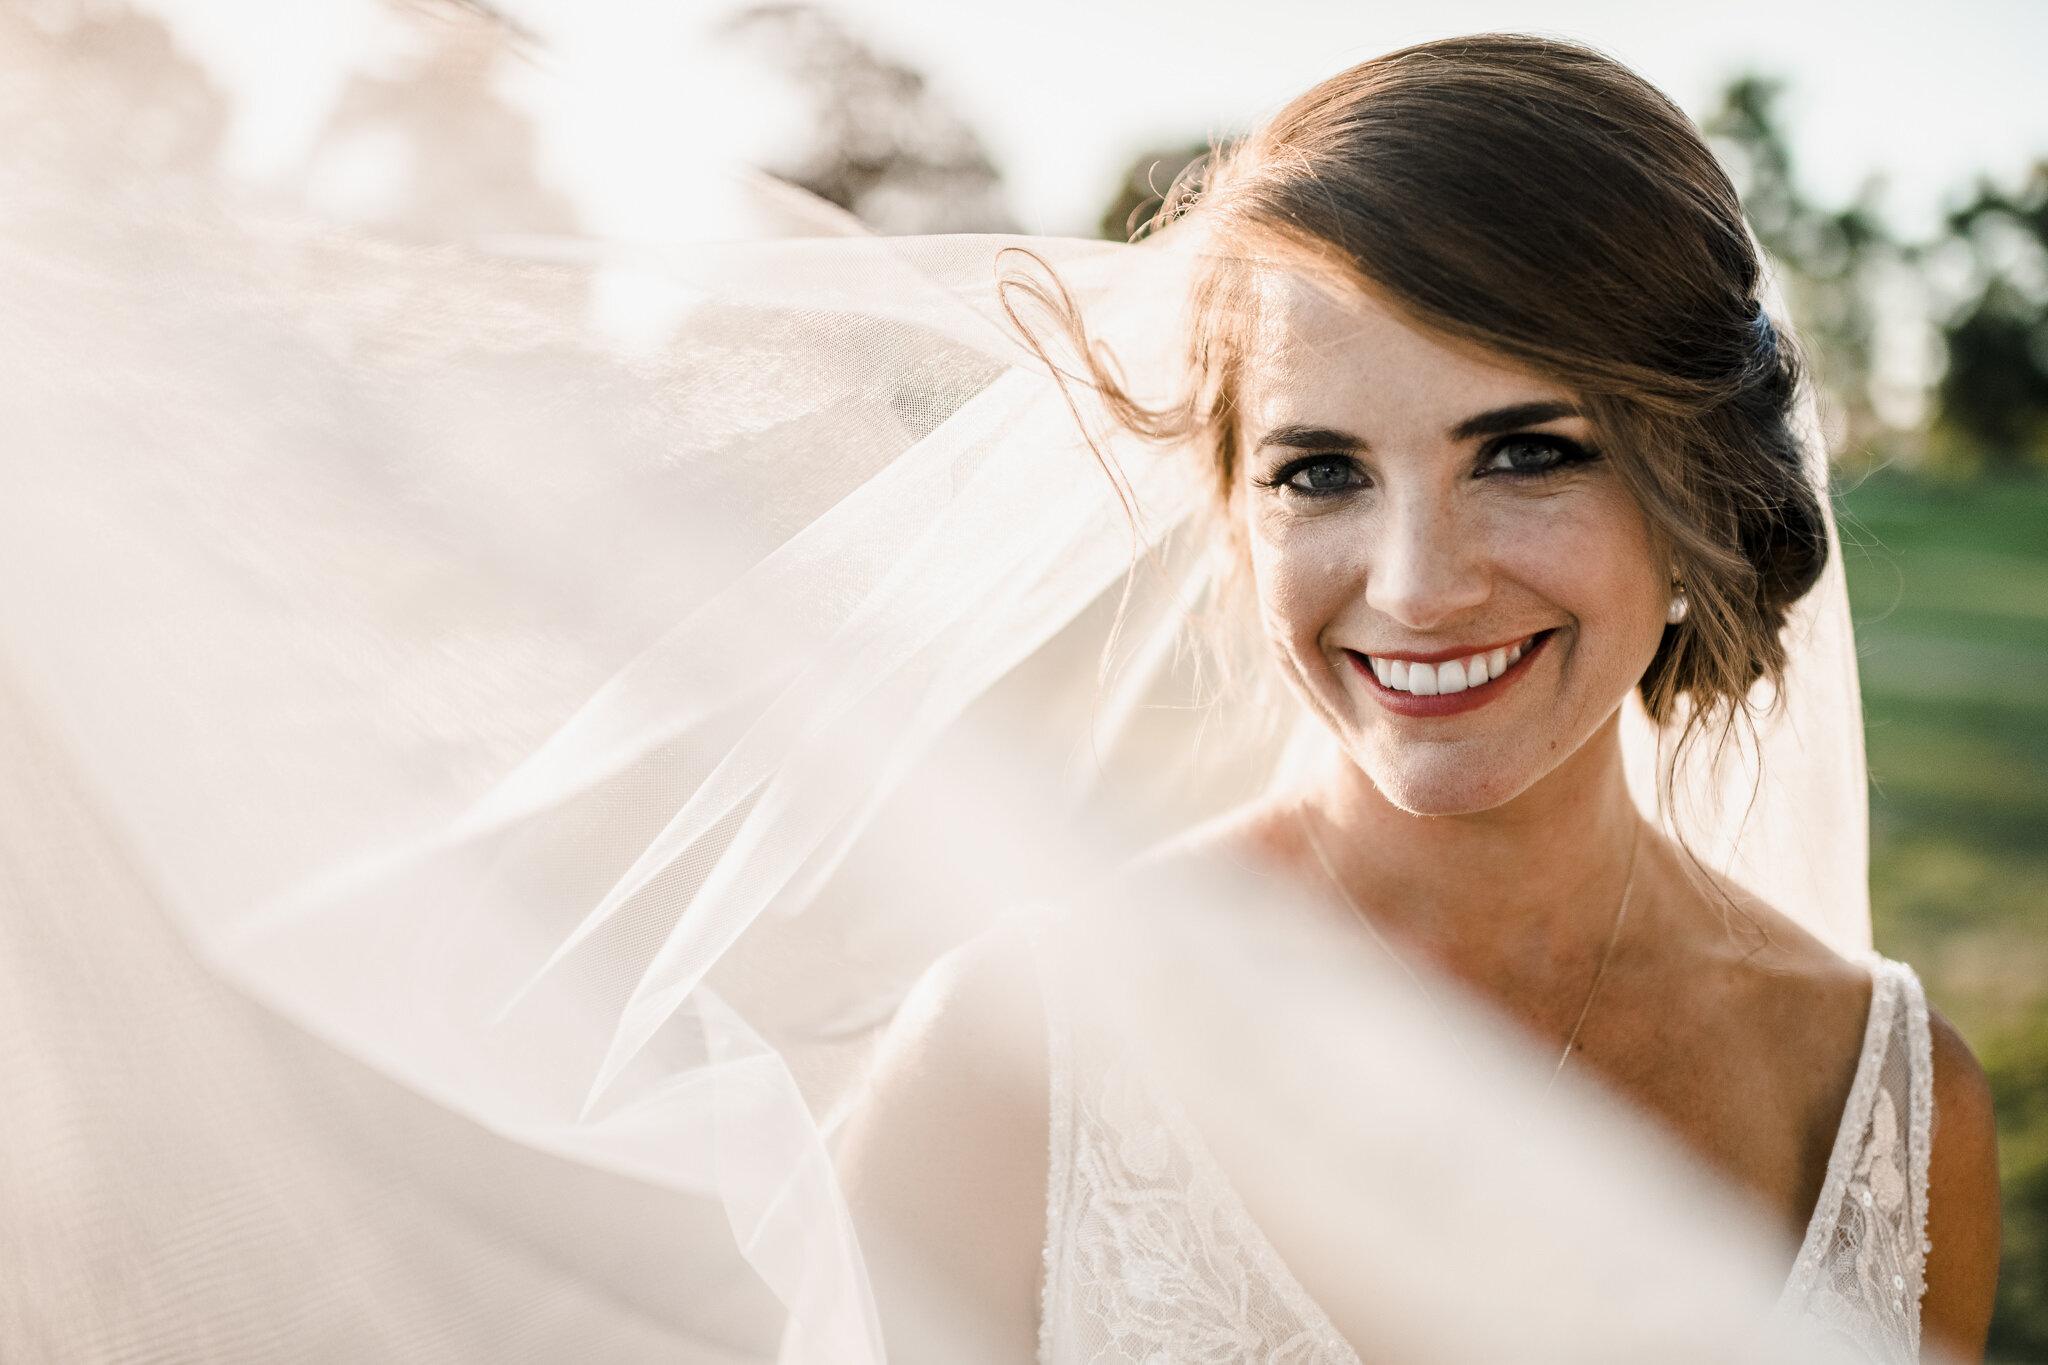 Coyle-Forsgate-Country-Club-Wedding-Photographer-20.JPG